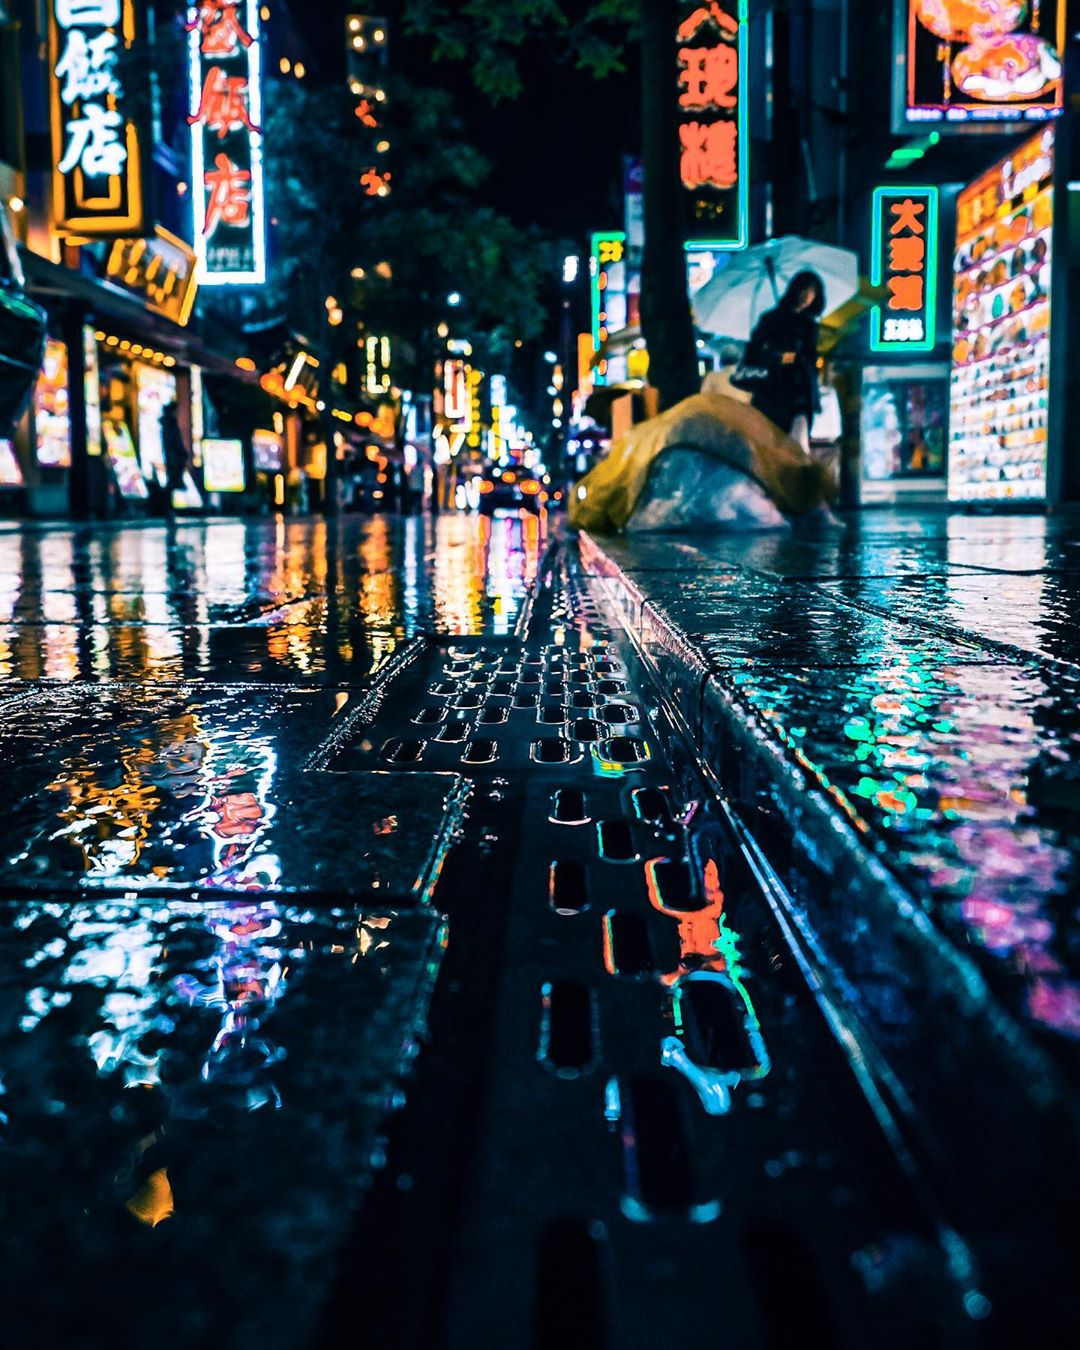 tokyo-nightlife-photography-hosokawa-ryohei-7